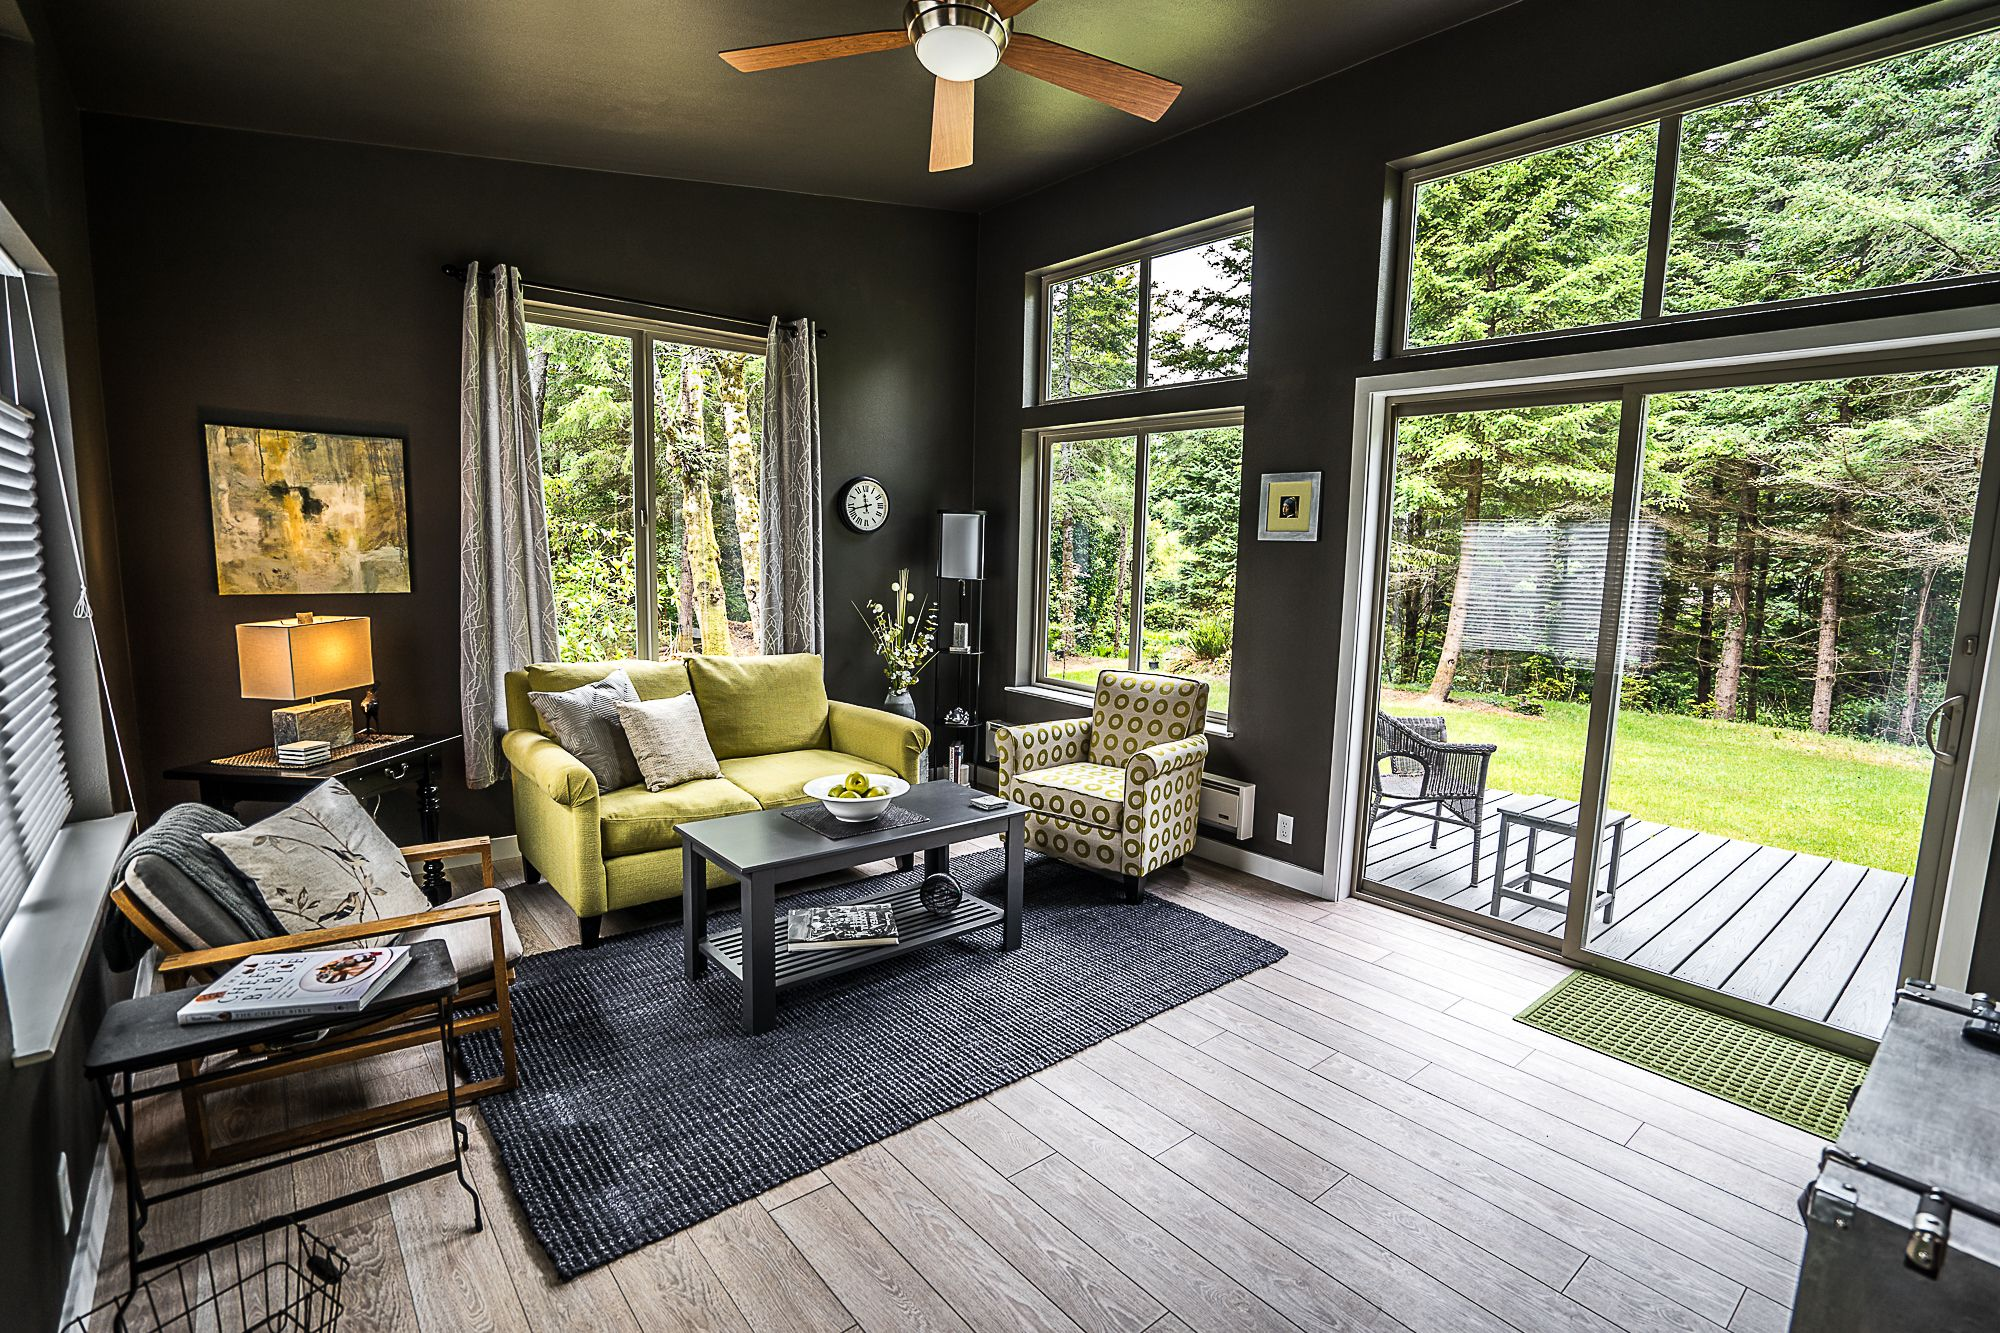 ideabox modular homes small living pinterest prefab tiny